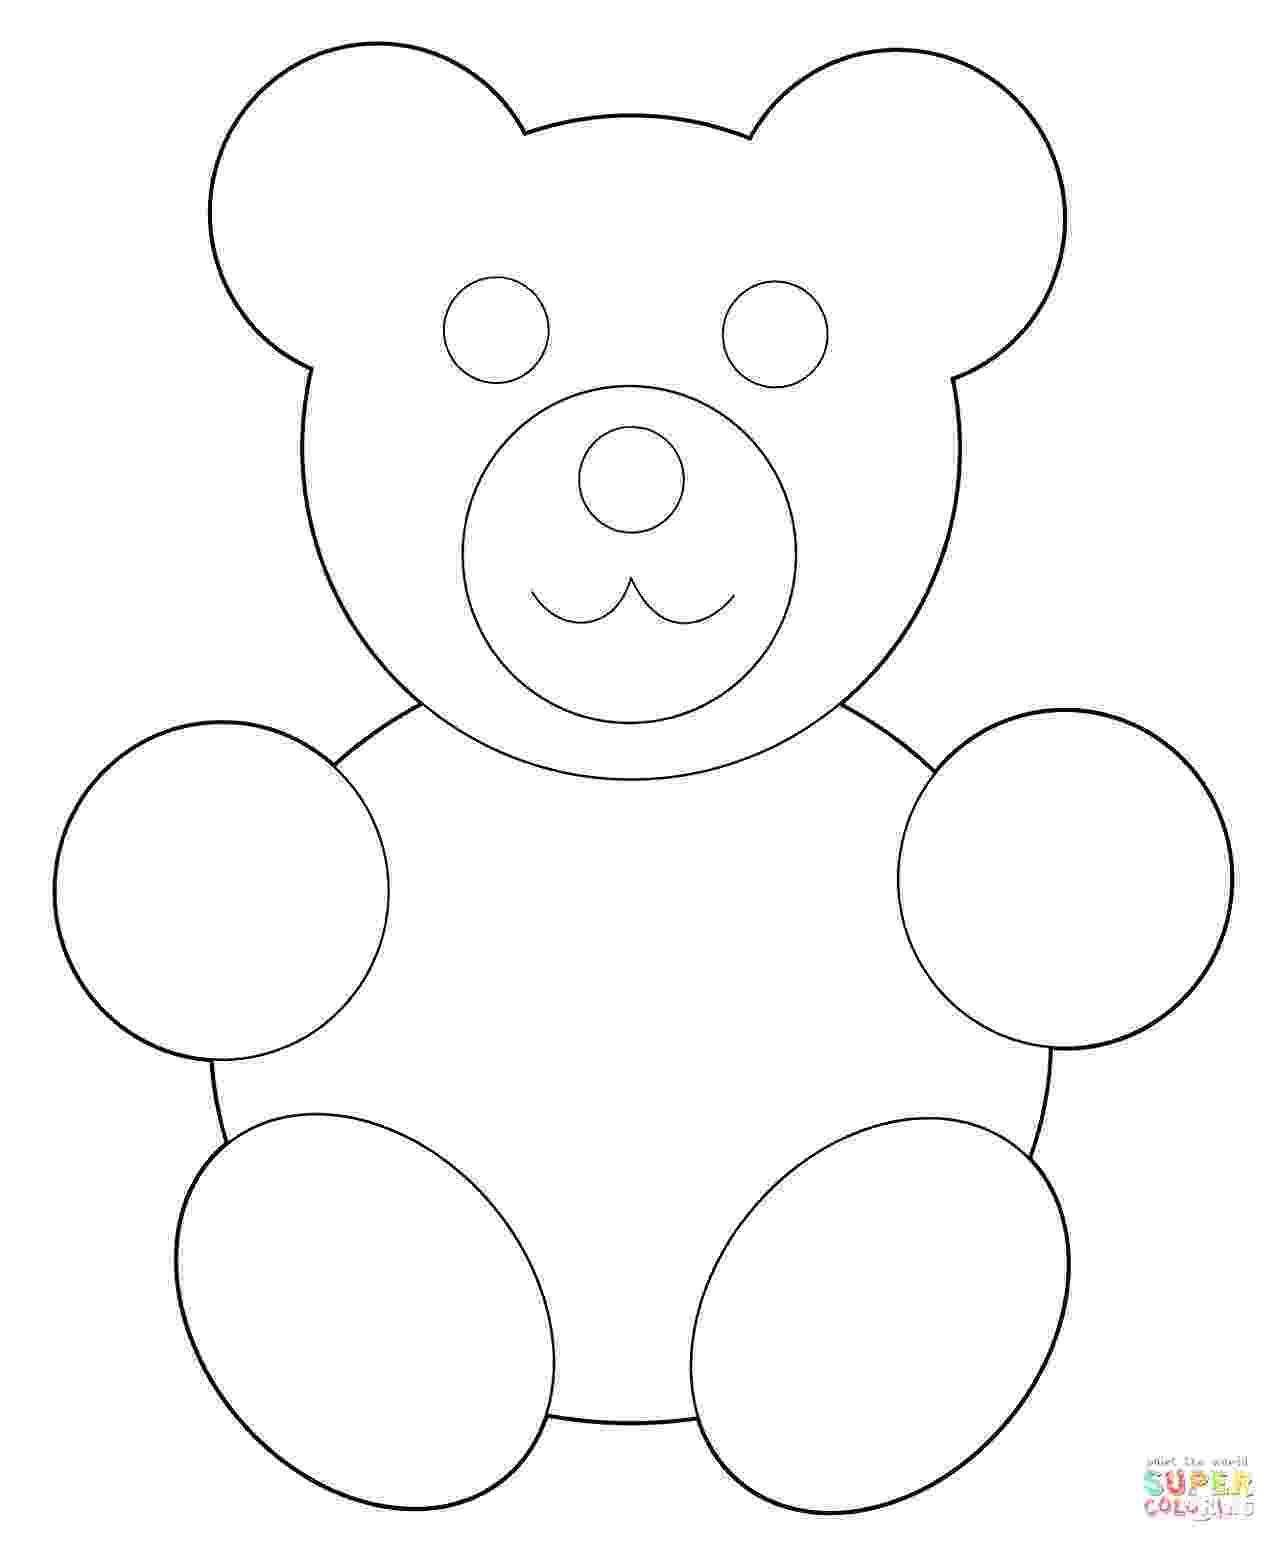 pudsey bear template printables printable bear ears printable pudsey bear template pudsey bear printables template